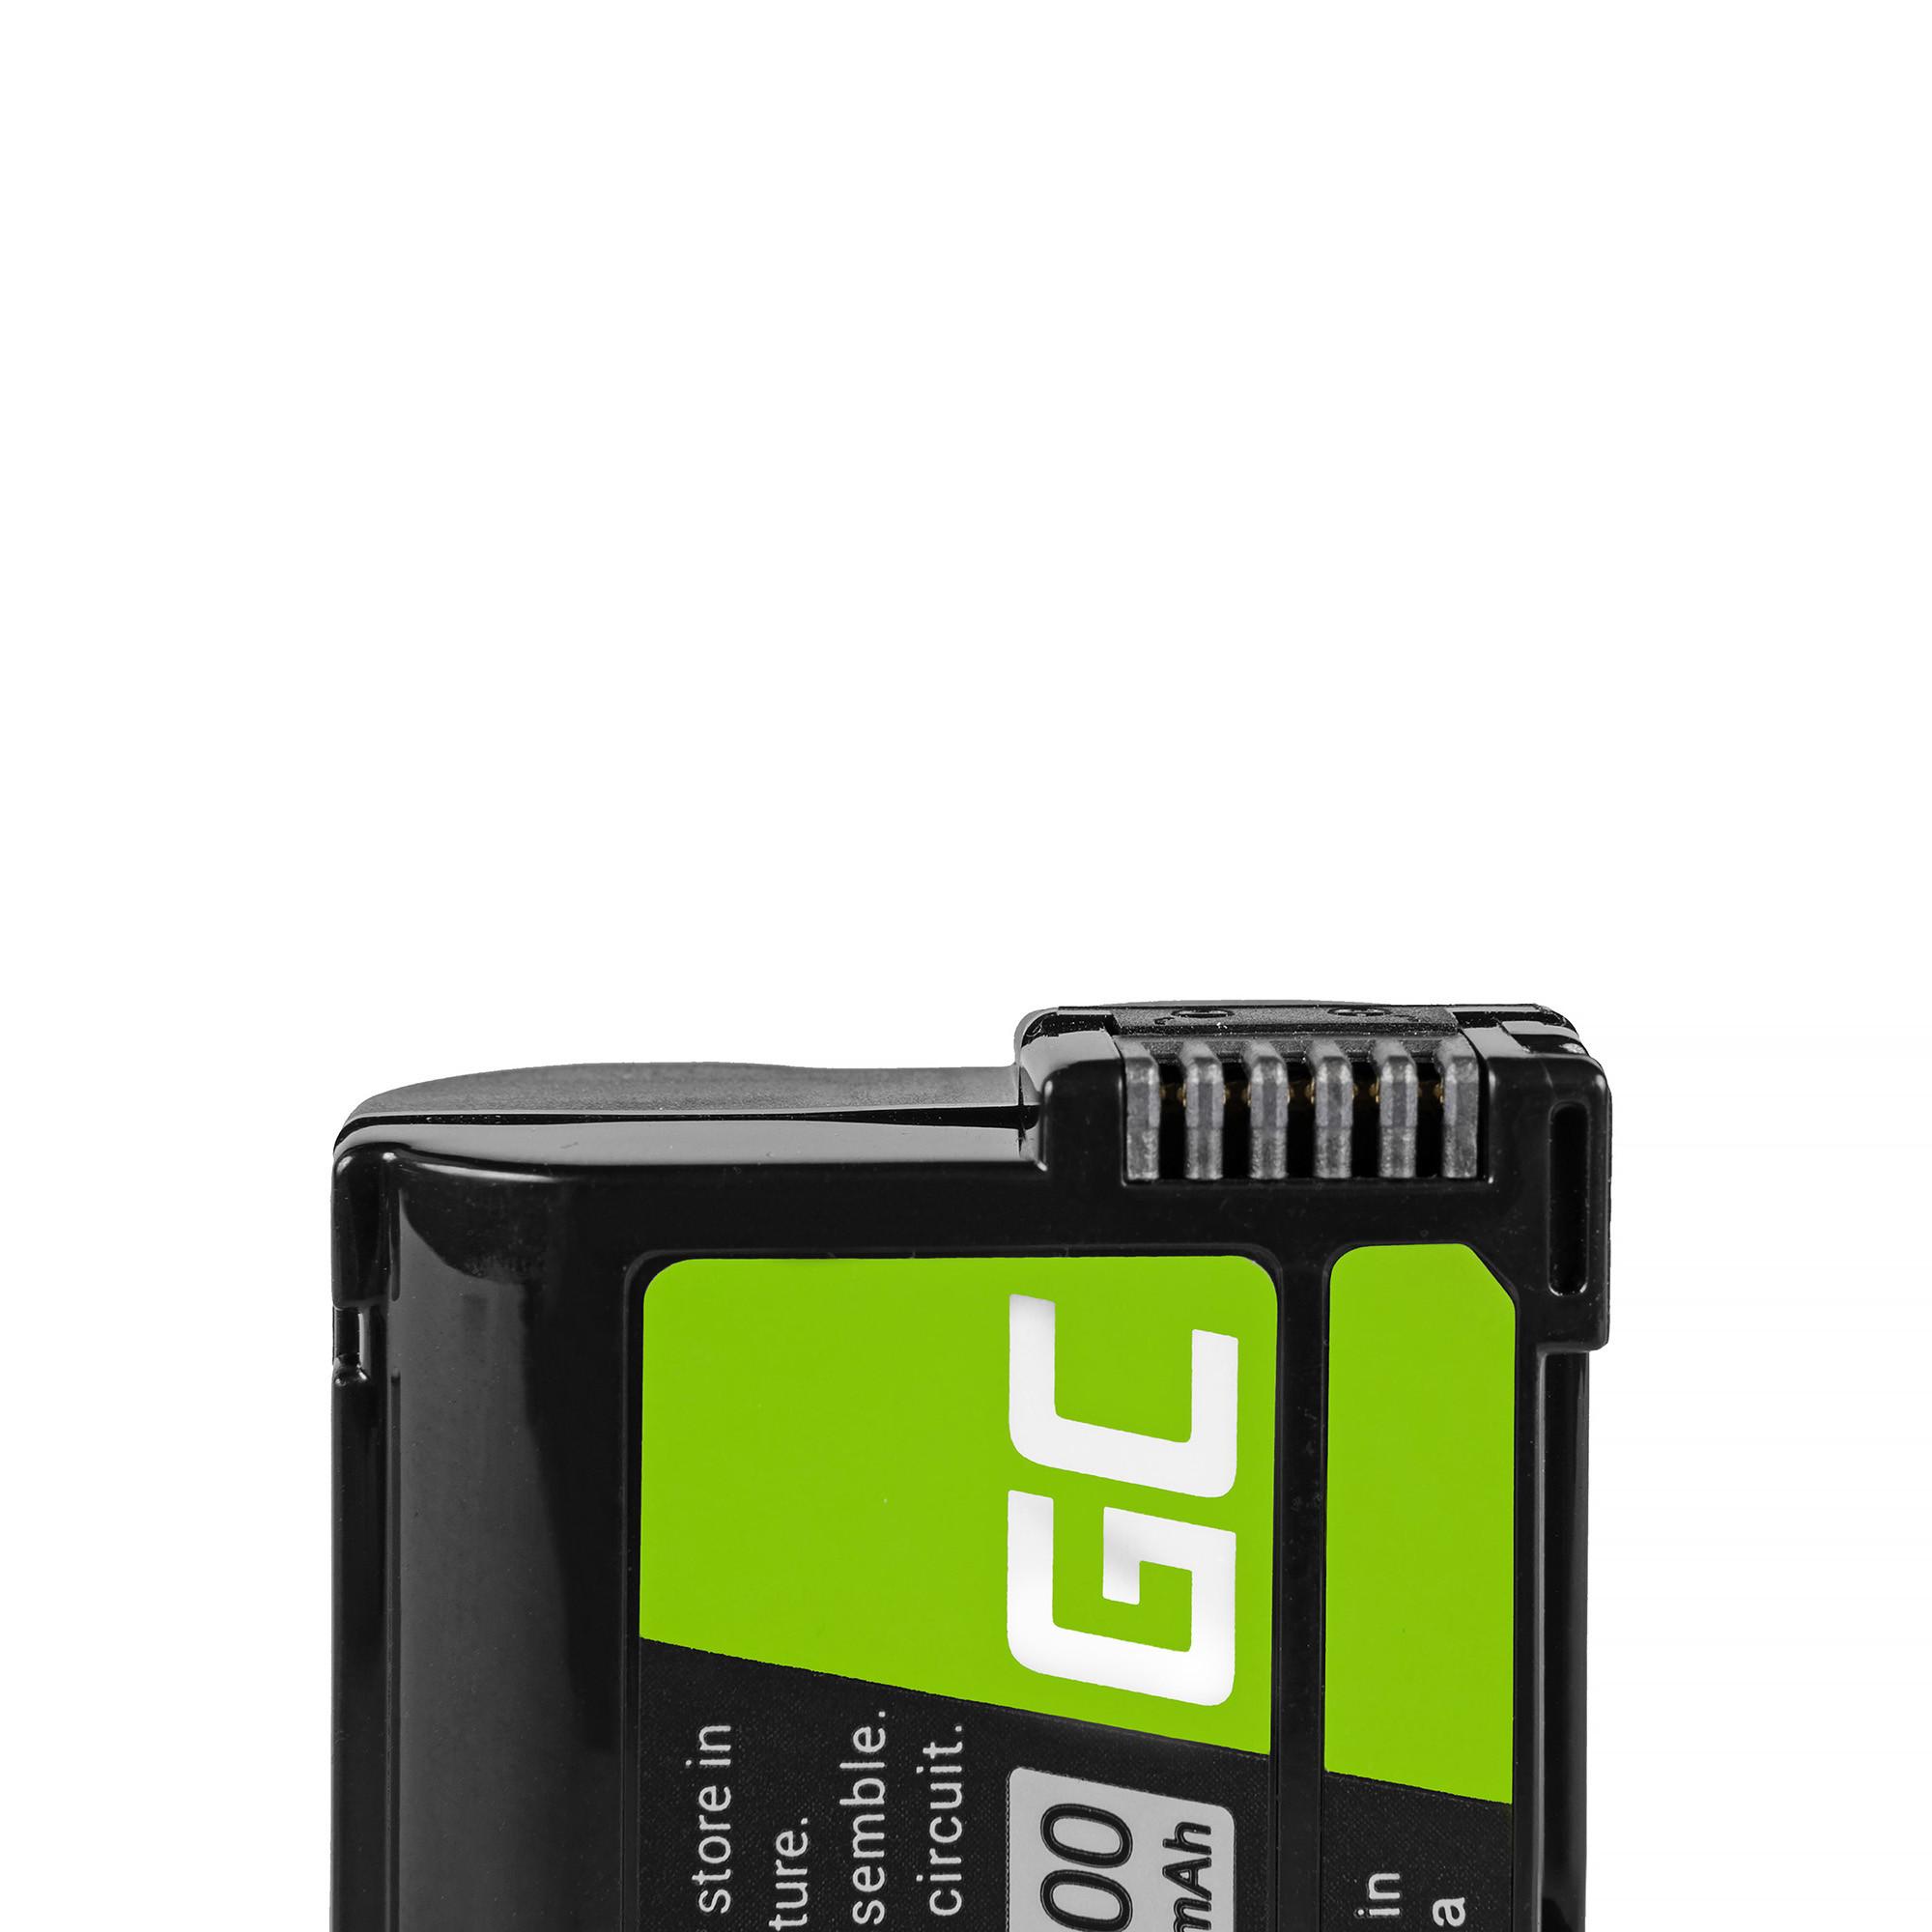 Green Cell Battery EN-EL15 ® Nikon D850, D810, D800, D750, D7500, D7200, D7100, D610, D600 7.0V 1400mAh